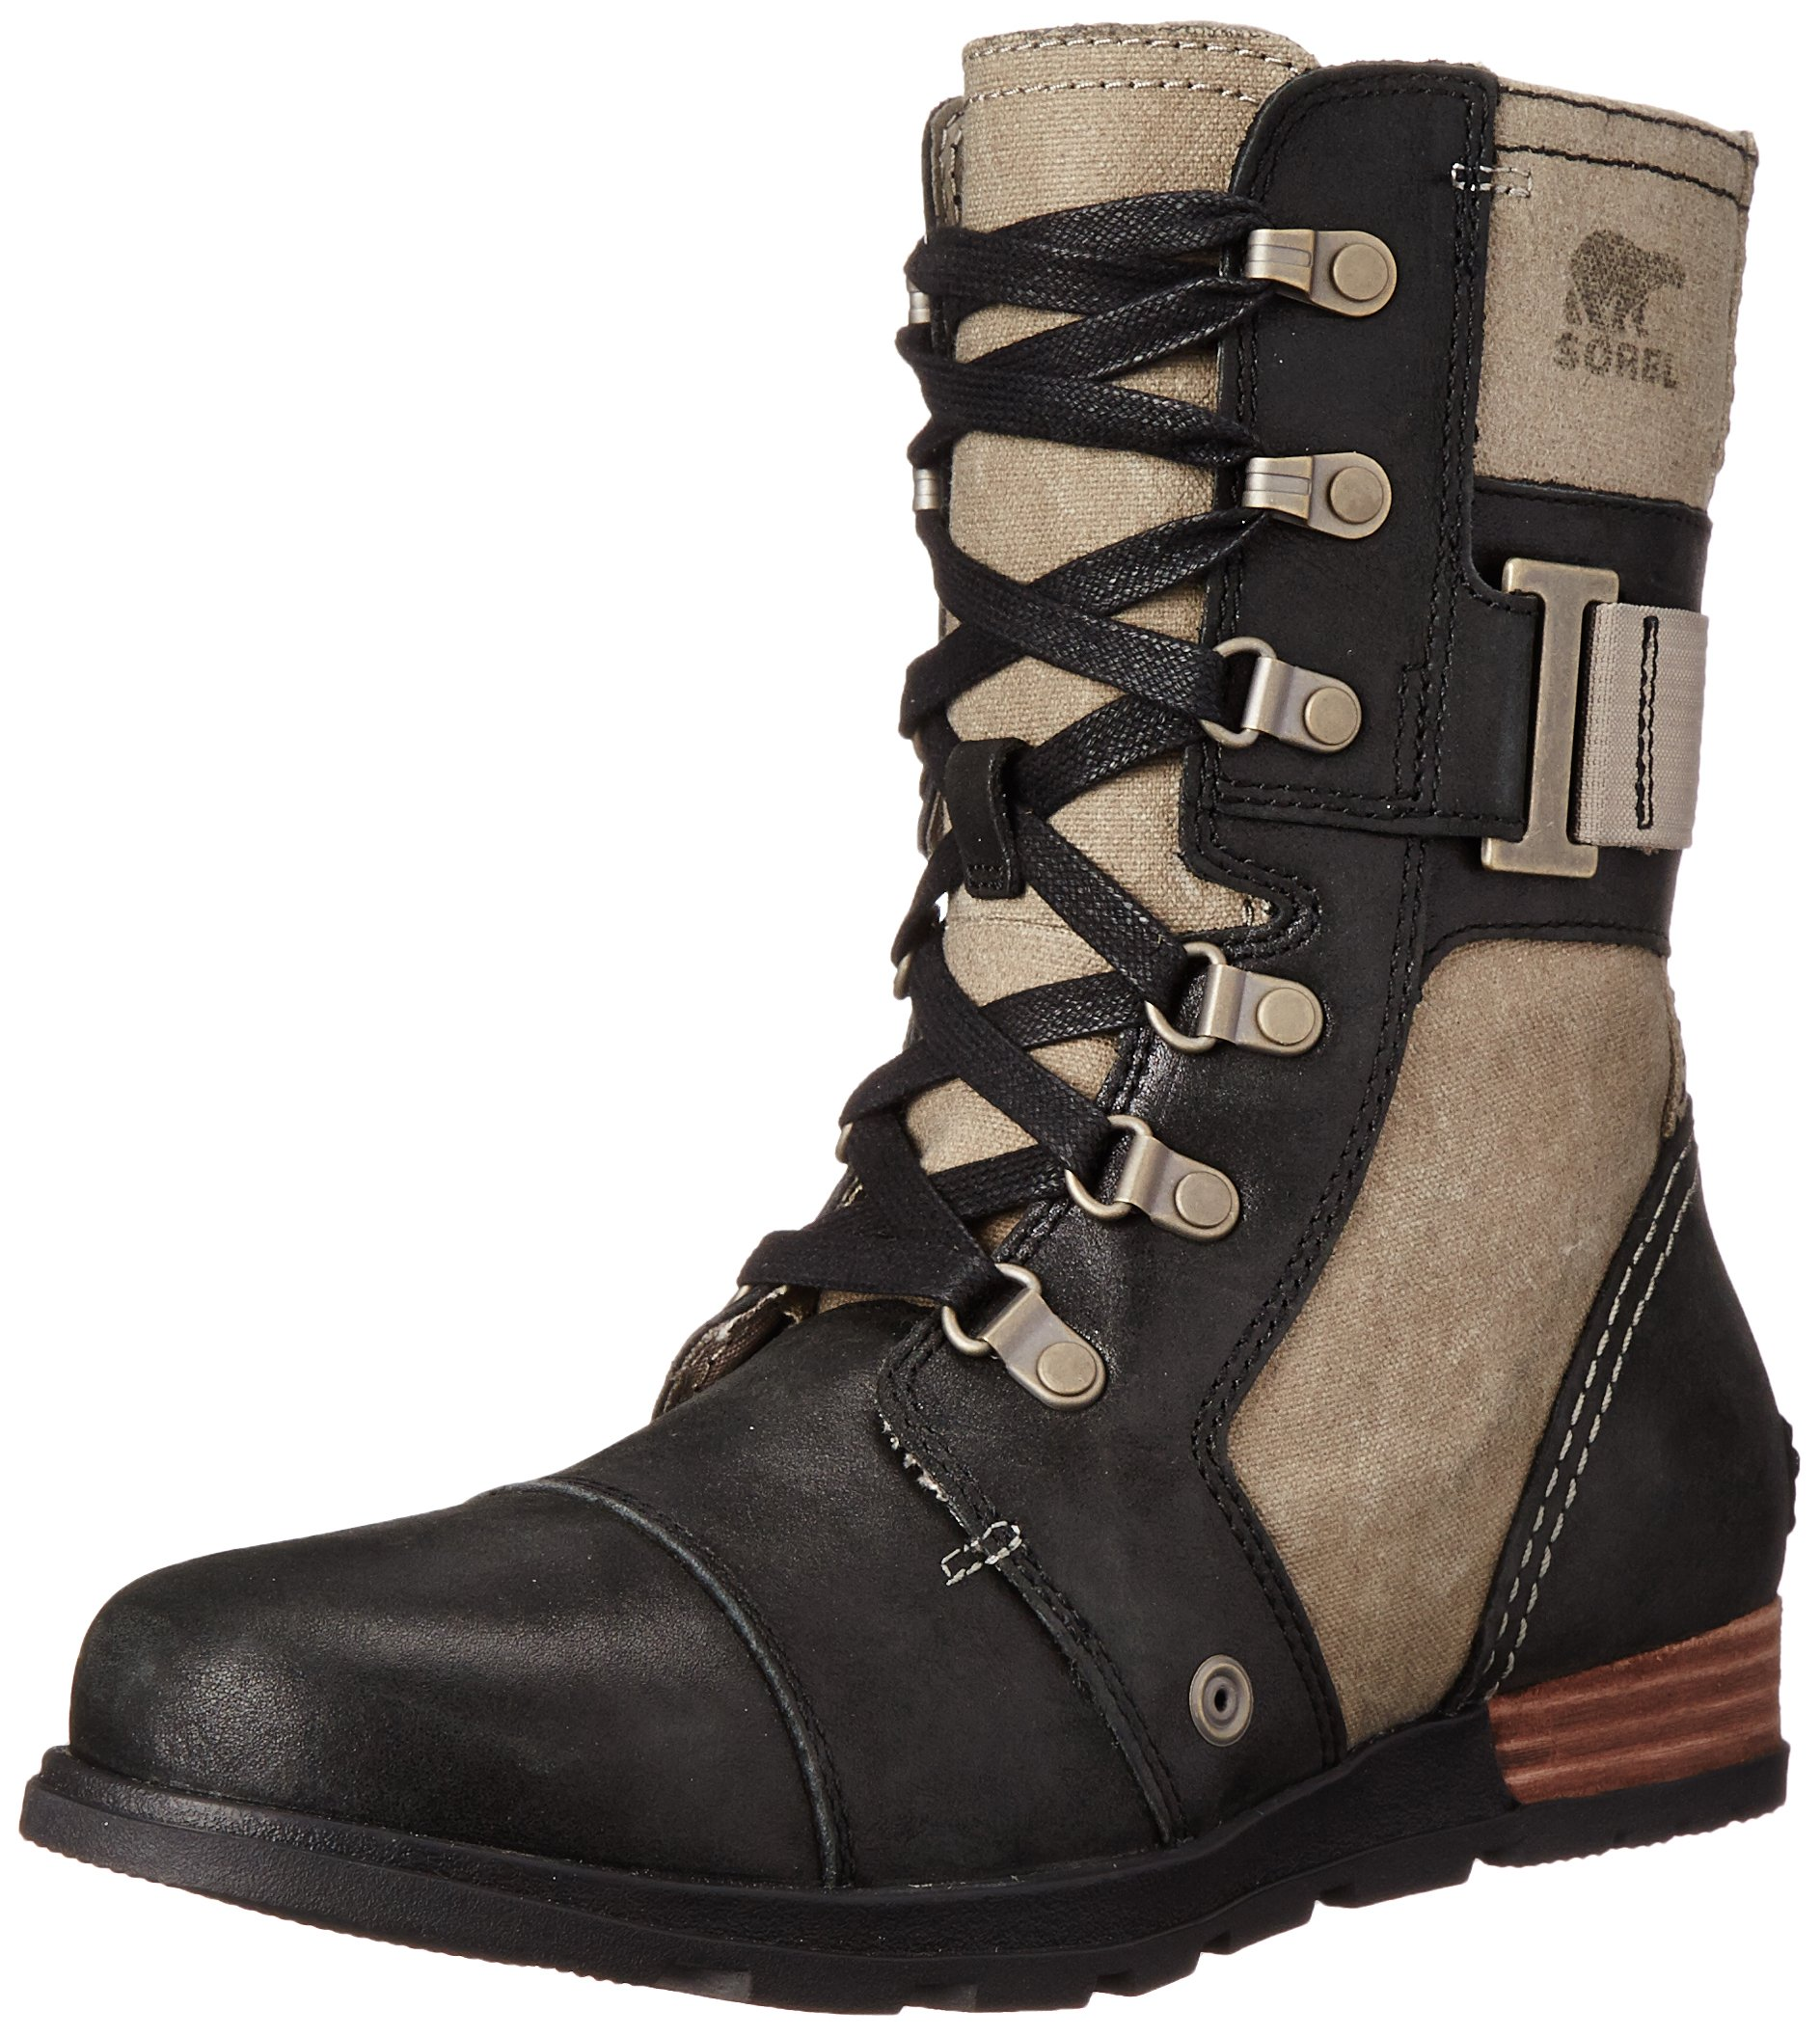 Sorel Women's Major Carly Snow Boot, Wet Sand, Black, 9.5 B US